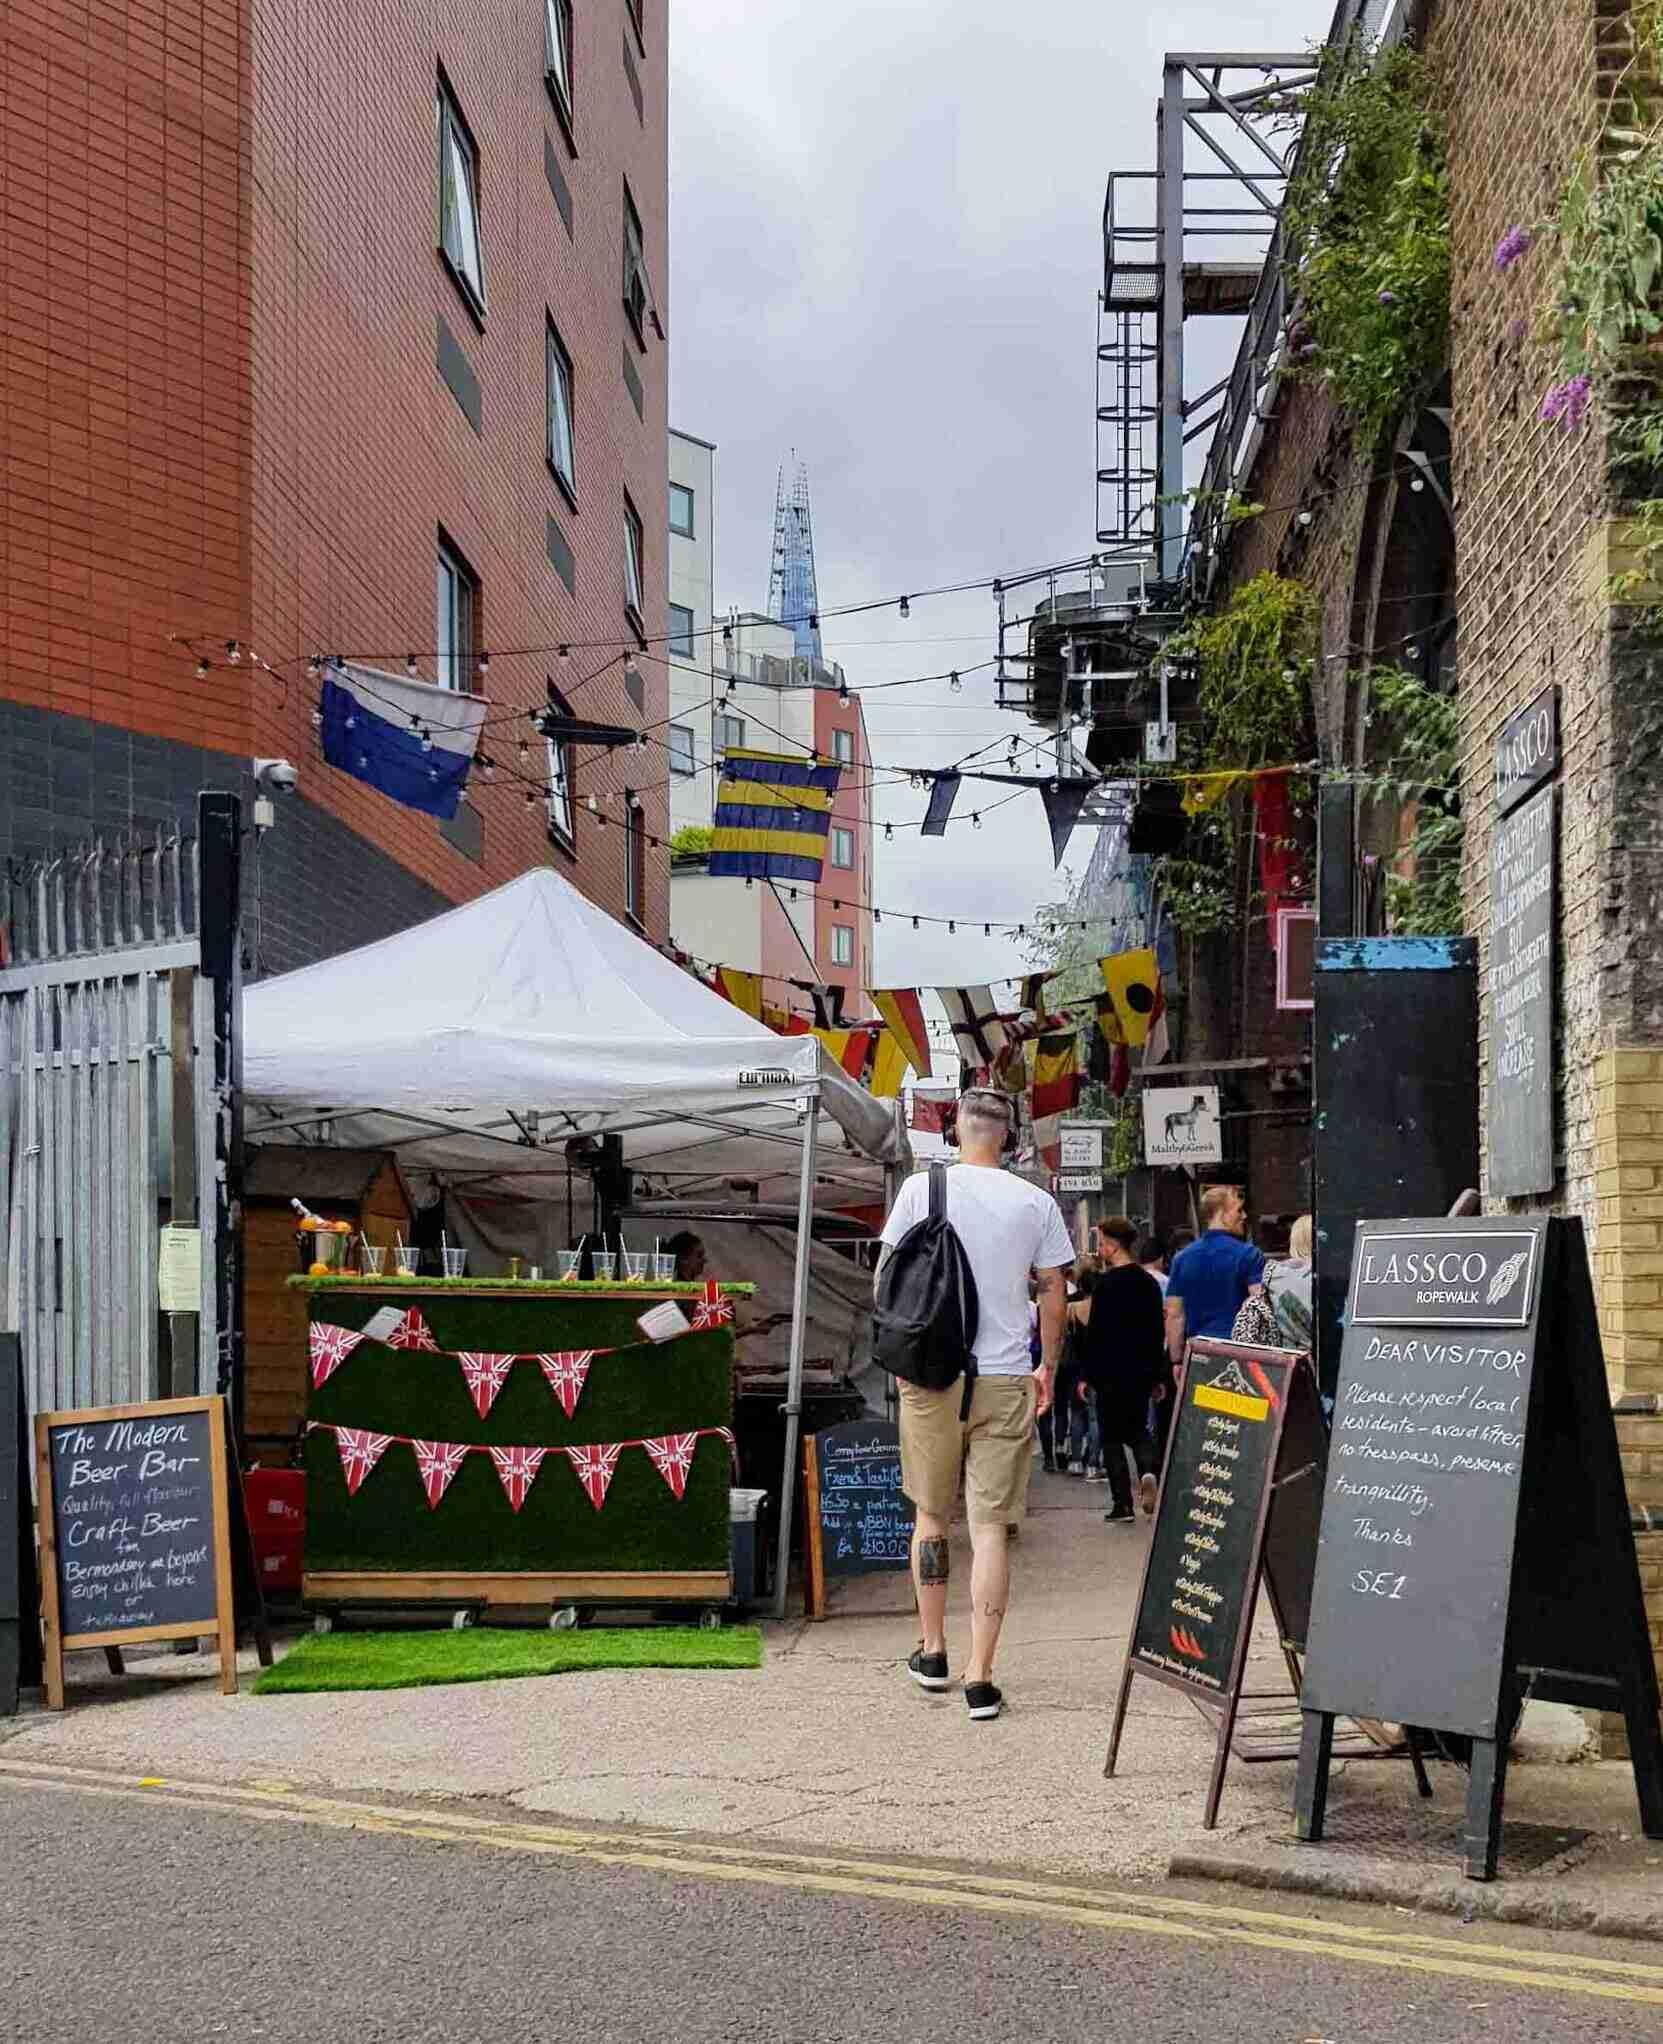 Maltby Street Markets